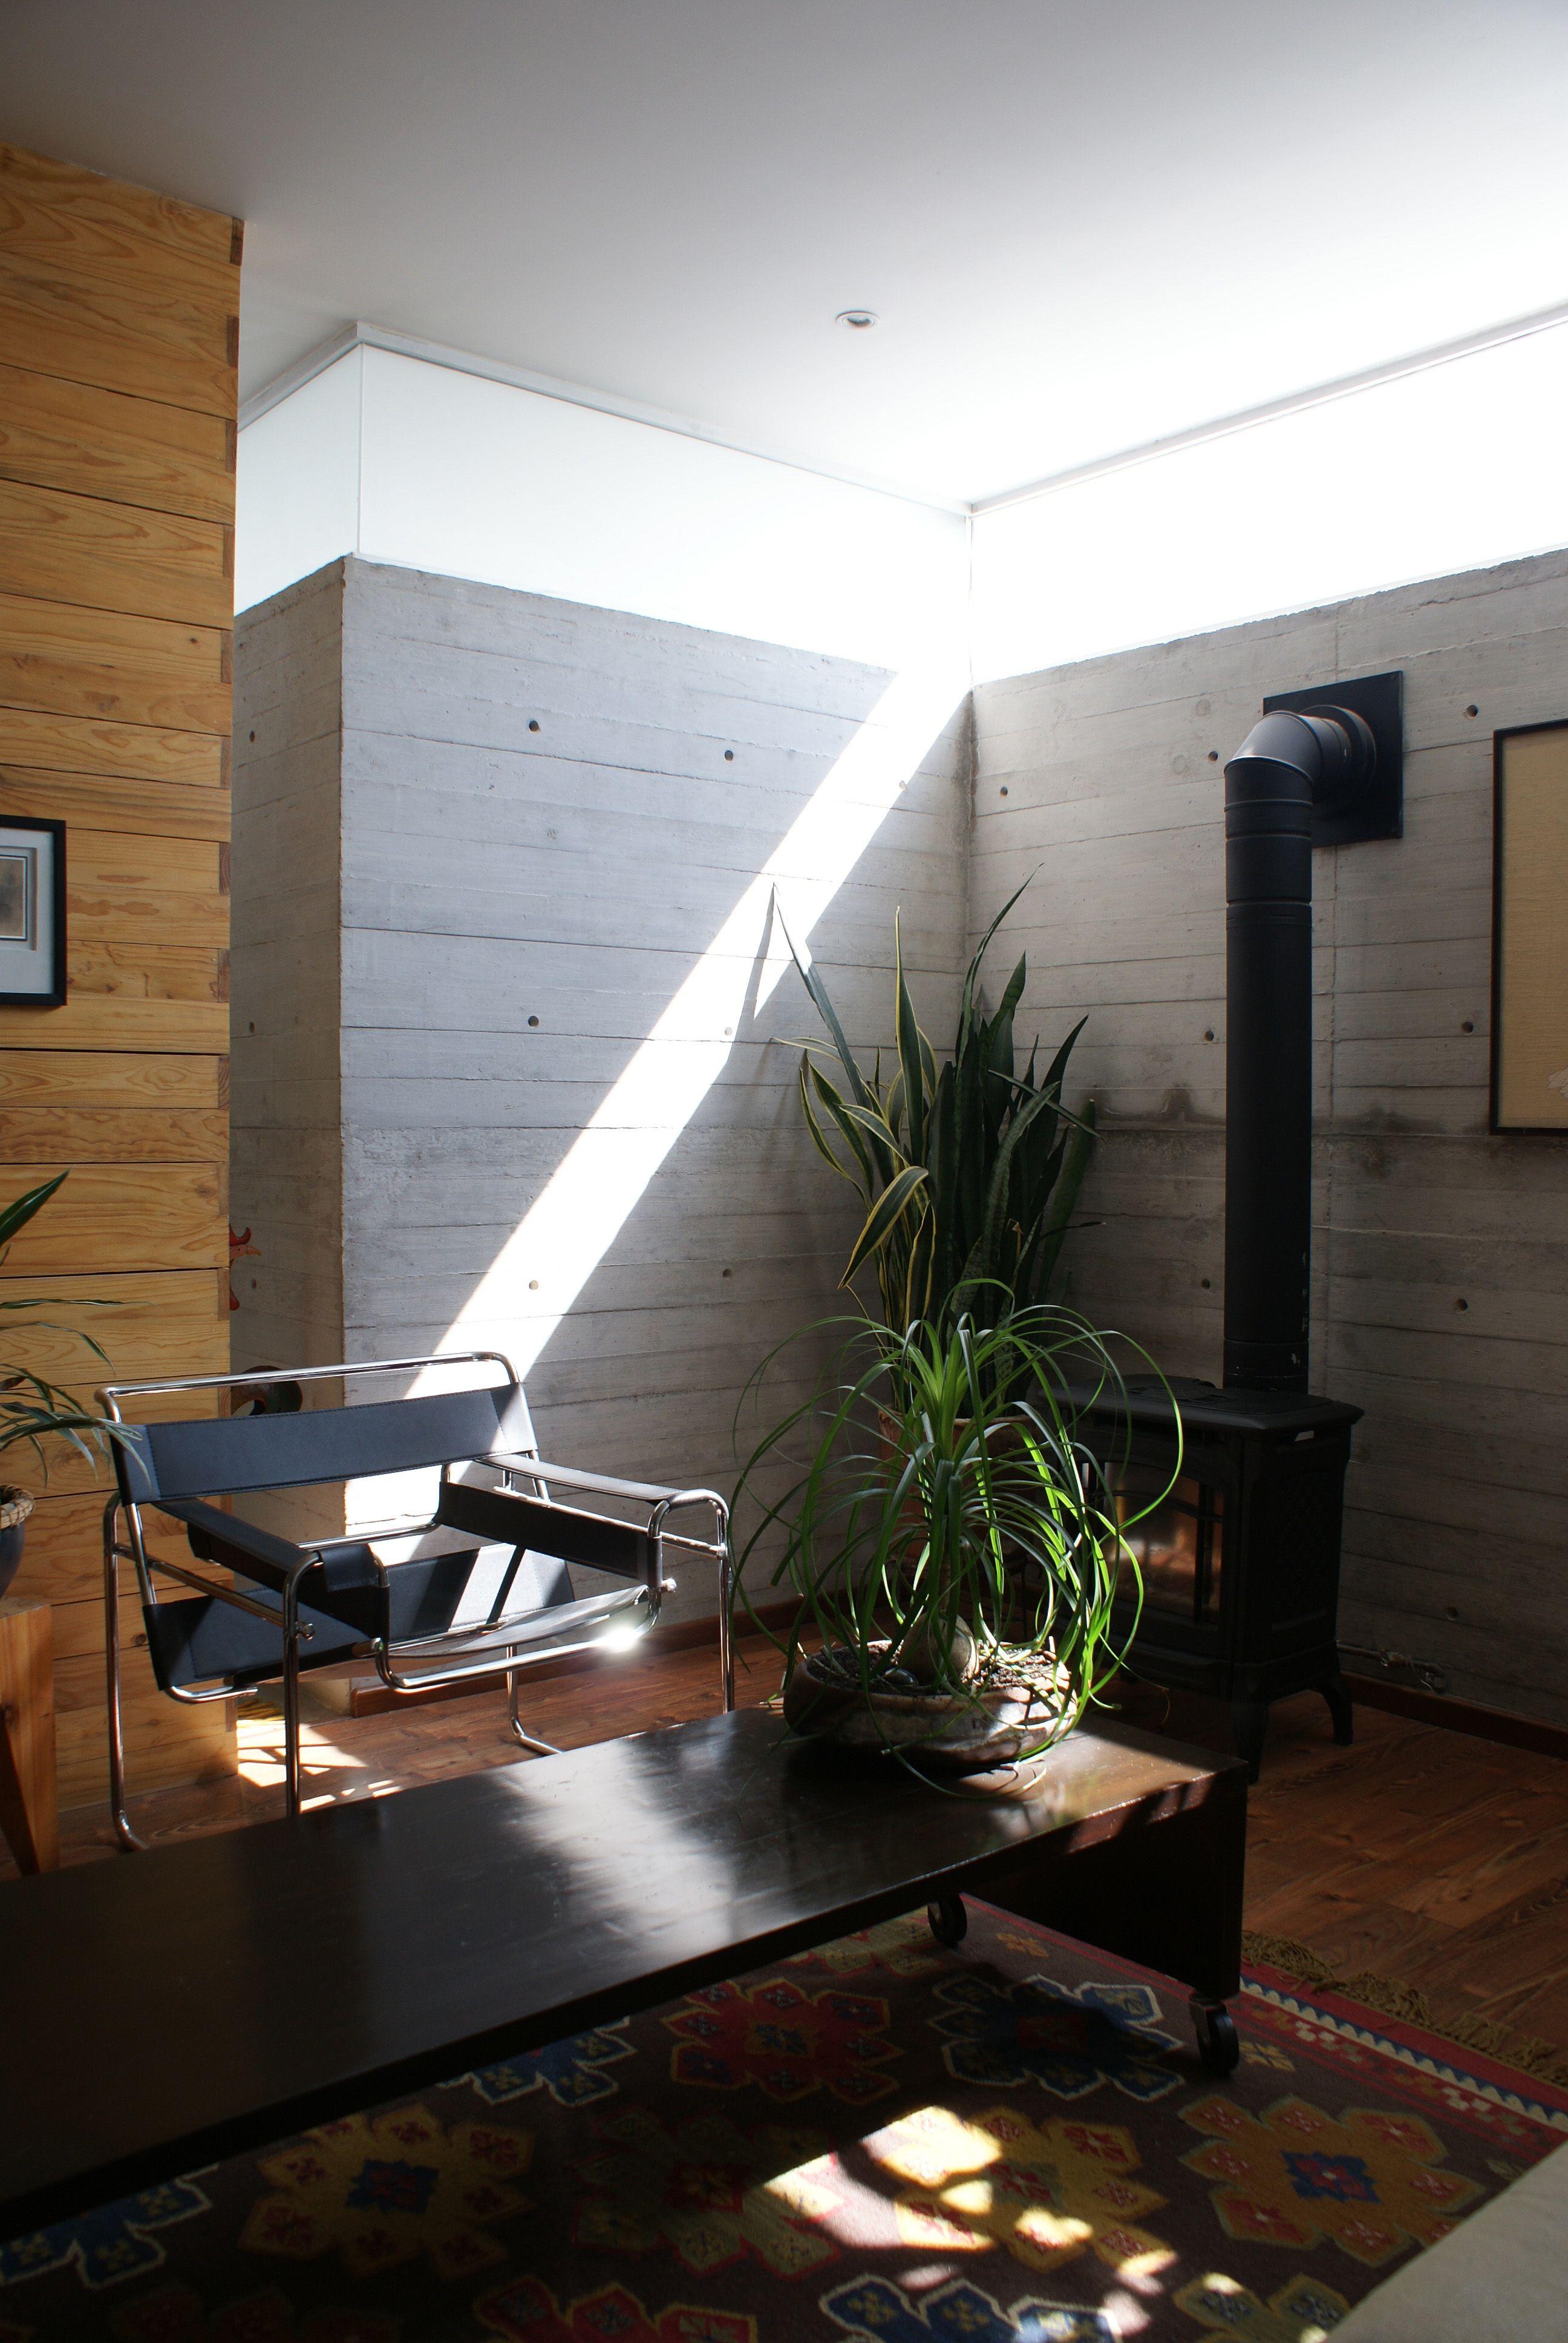 Casa dm dionne arquitectos design interior - Arquitectos de interiores famosos ...